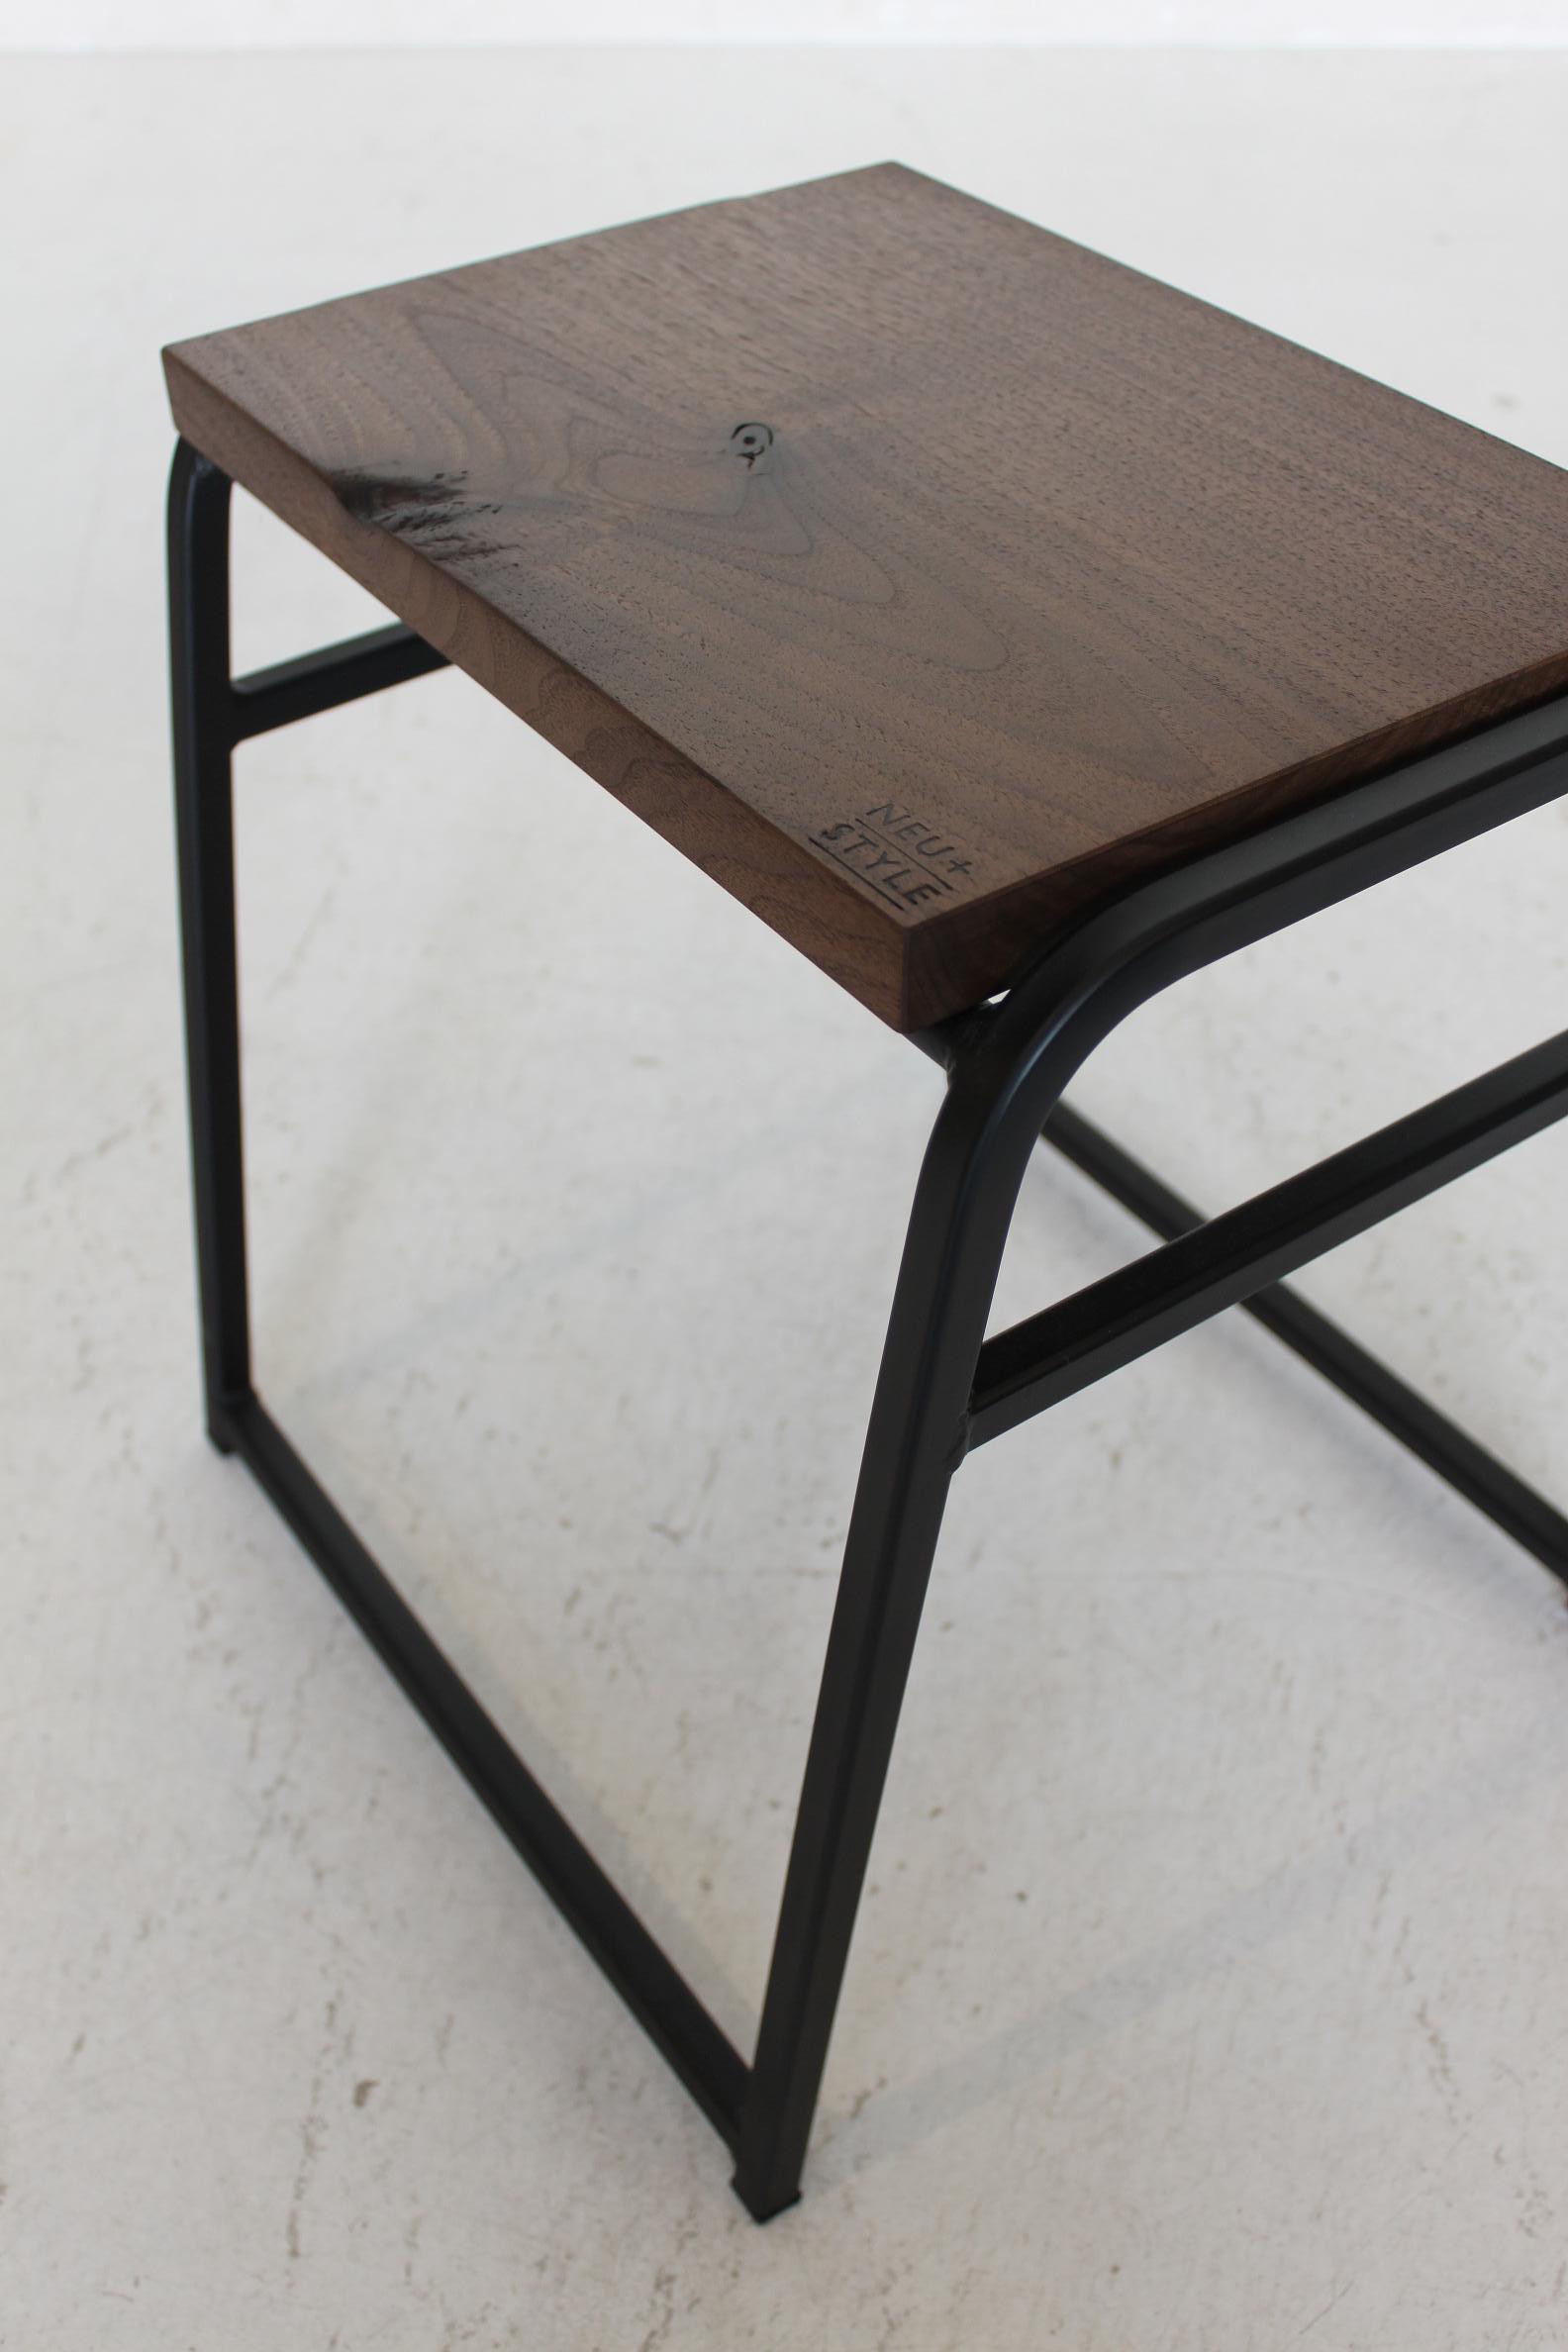 NS DINING TABLE & ANTIQUE STOOL_c0146581_14454228.jpg